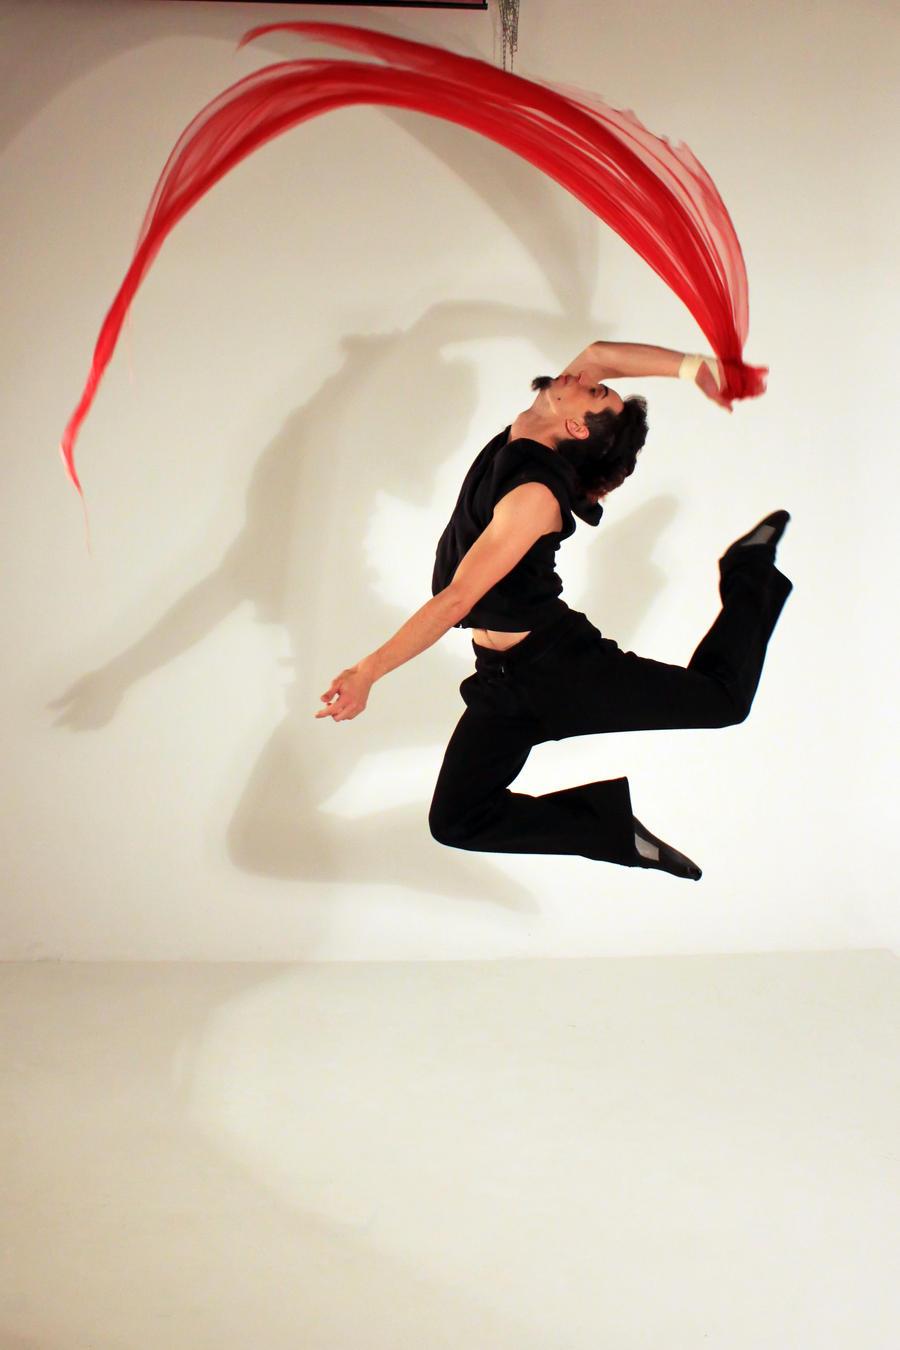 Dance11 1 by DaeStock